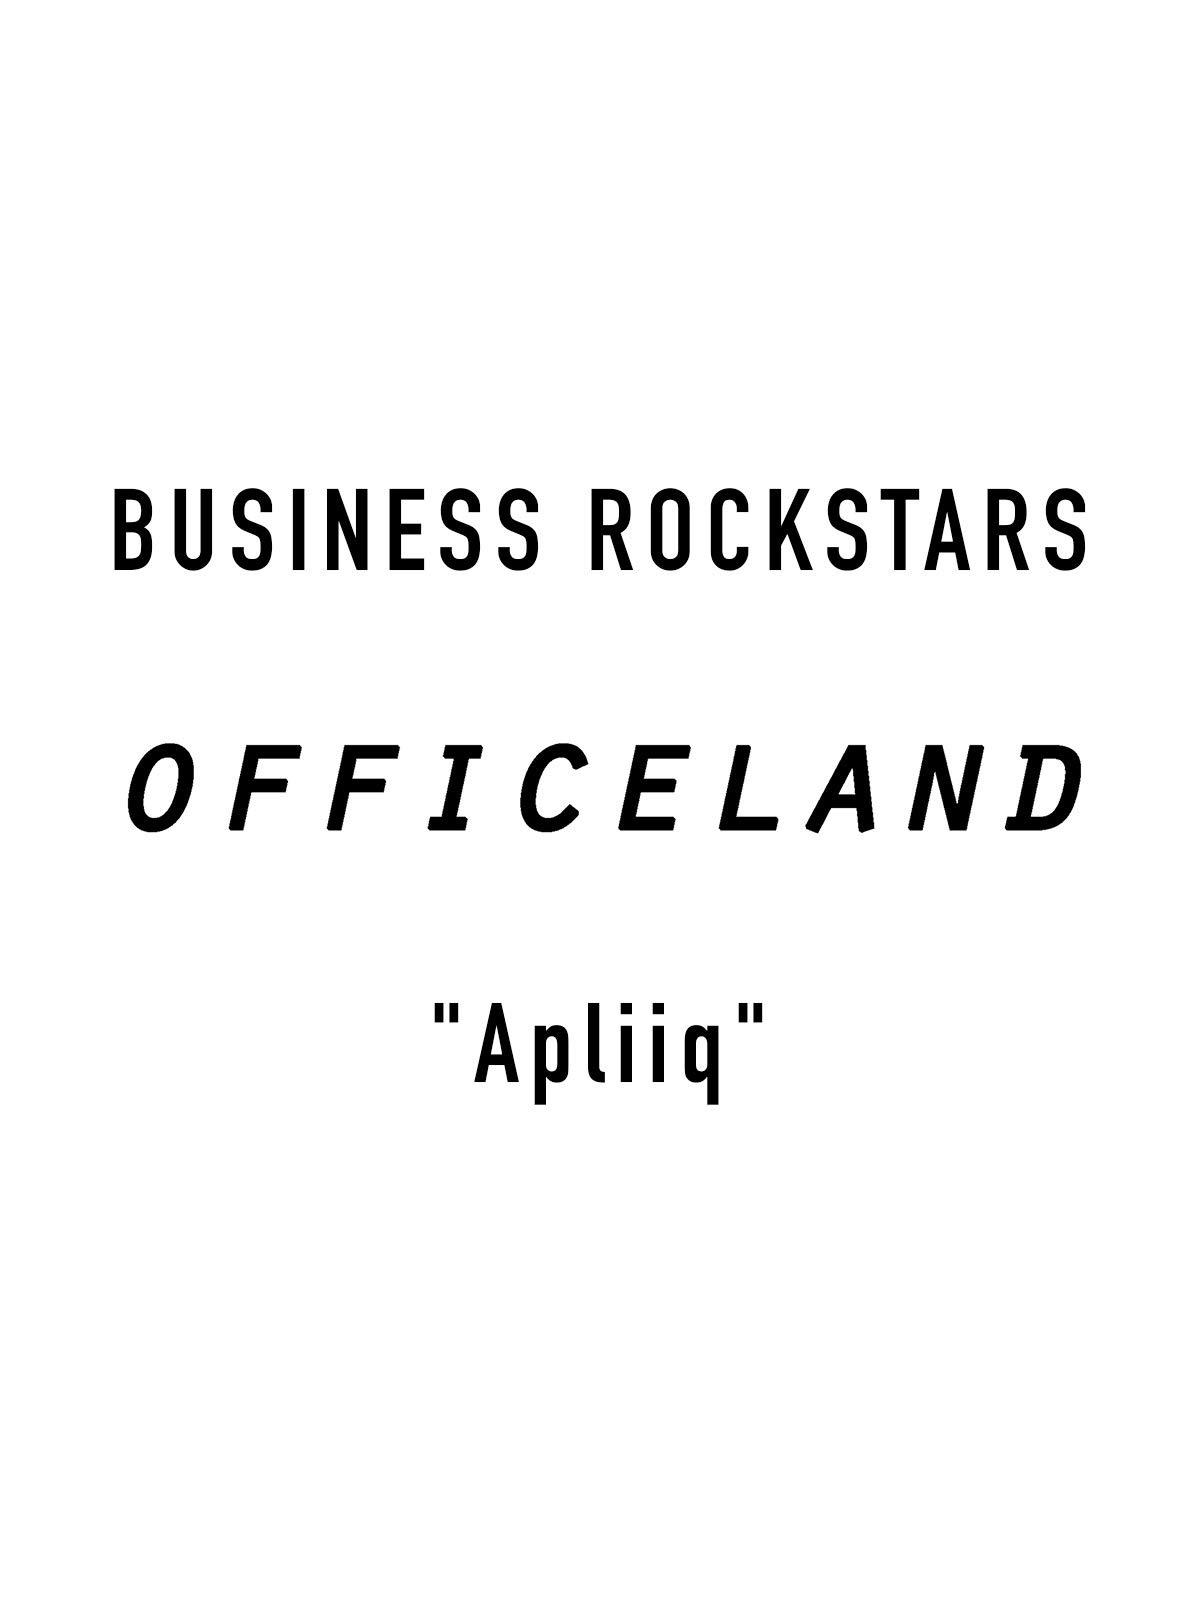 "Business Rockstars Officeland ""Apliiq"""